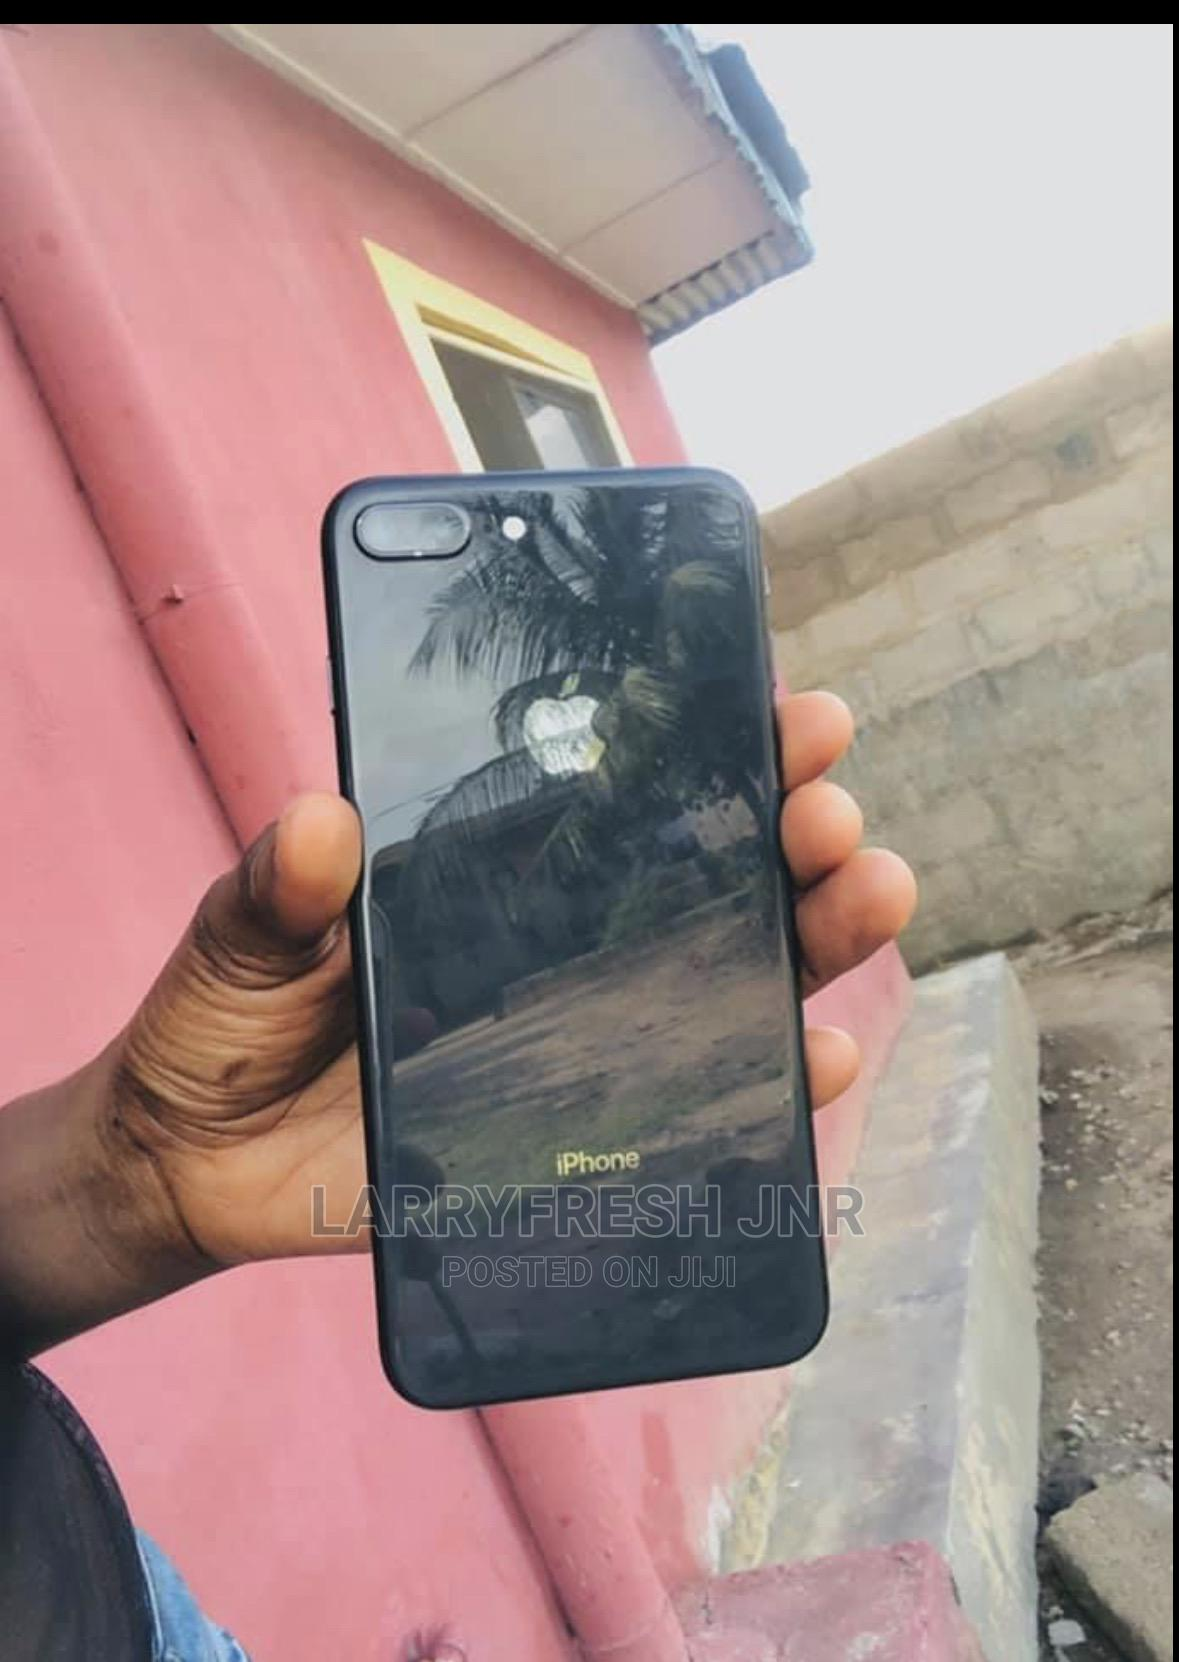 Apple iPhone 8 Plus 64 GB Black | Mobile Phones for sale in Calabar, Cross River State, Nigeria